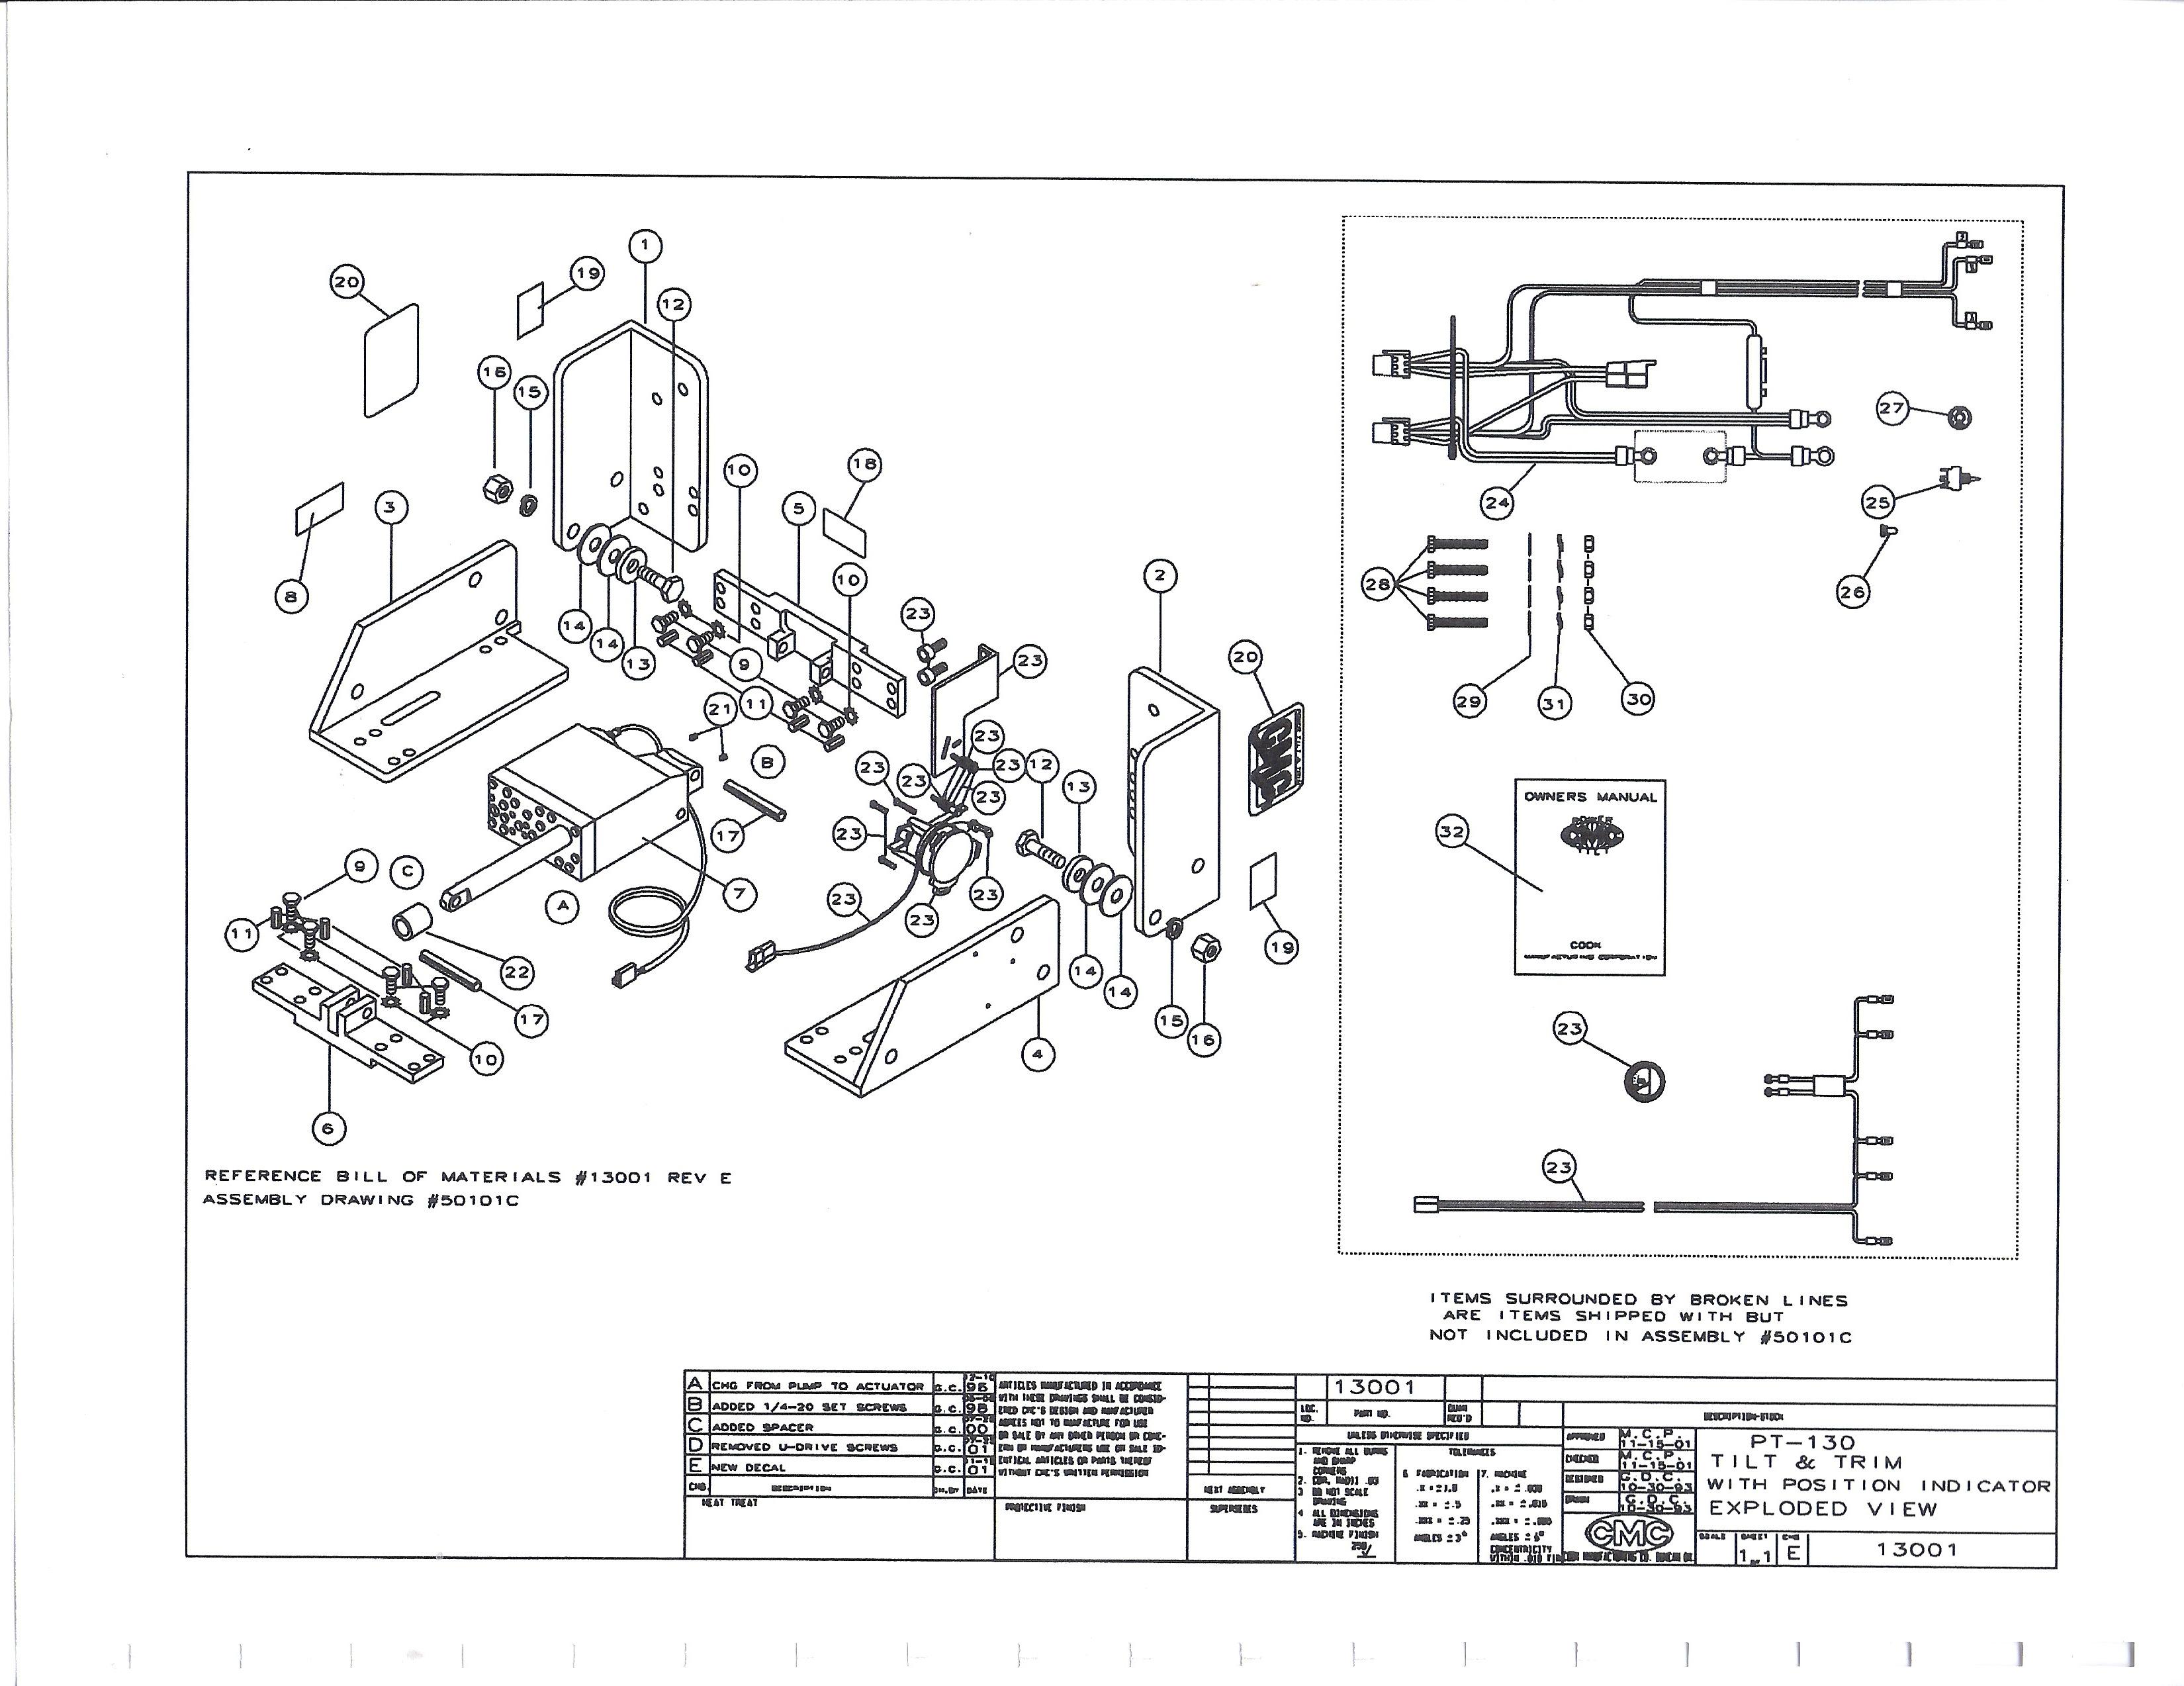 jack plate wiring diagram 13 pin towbar uk replacement parts for the cmc pt 130 tilt trim unit